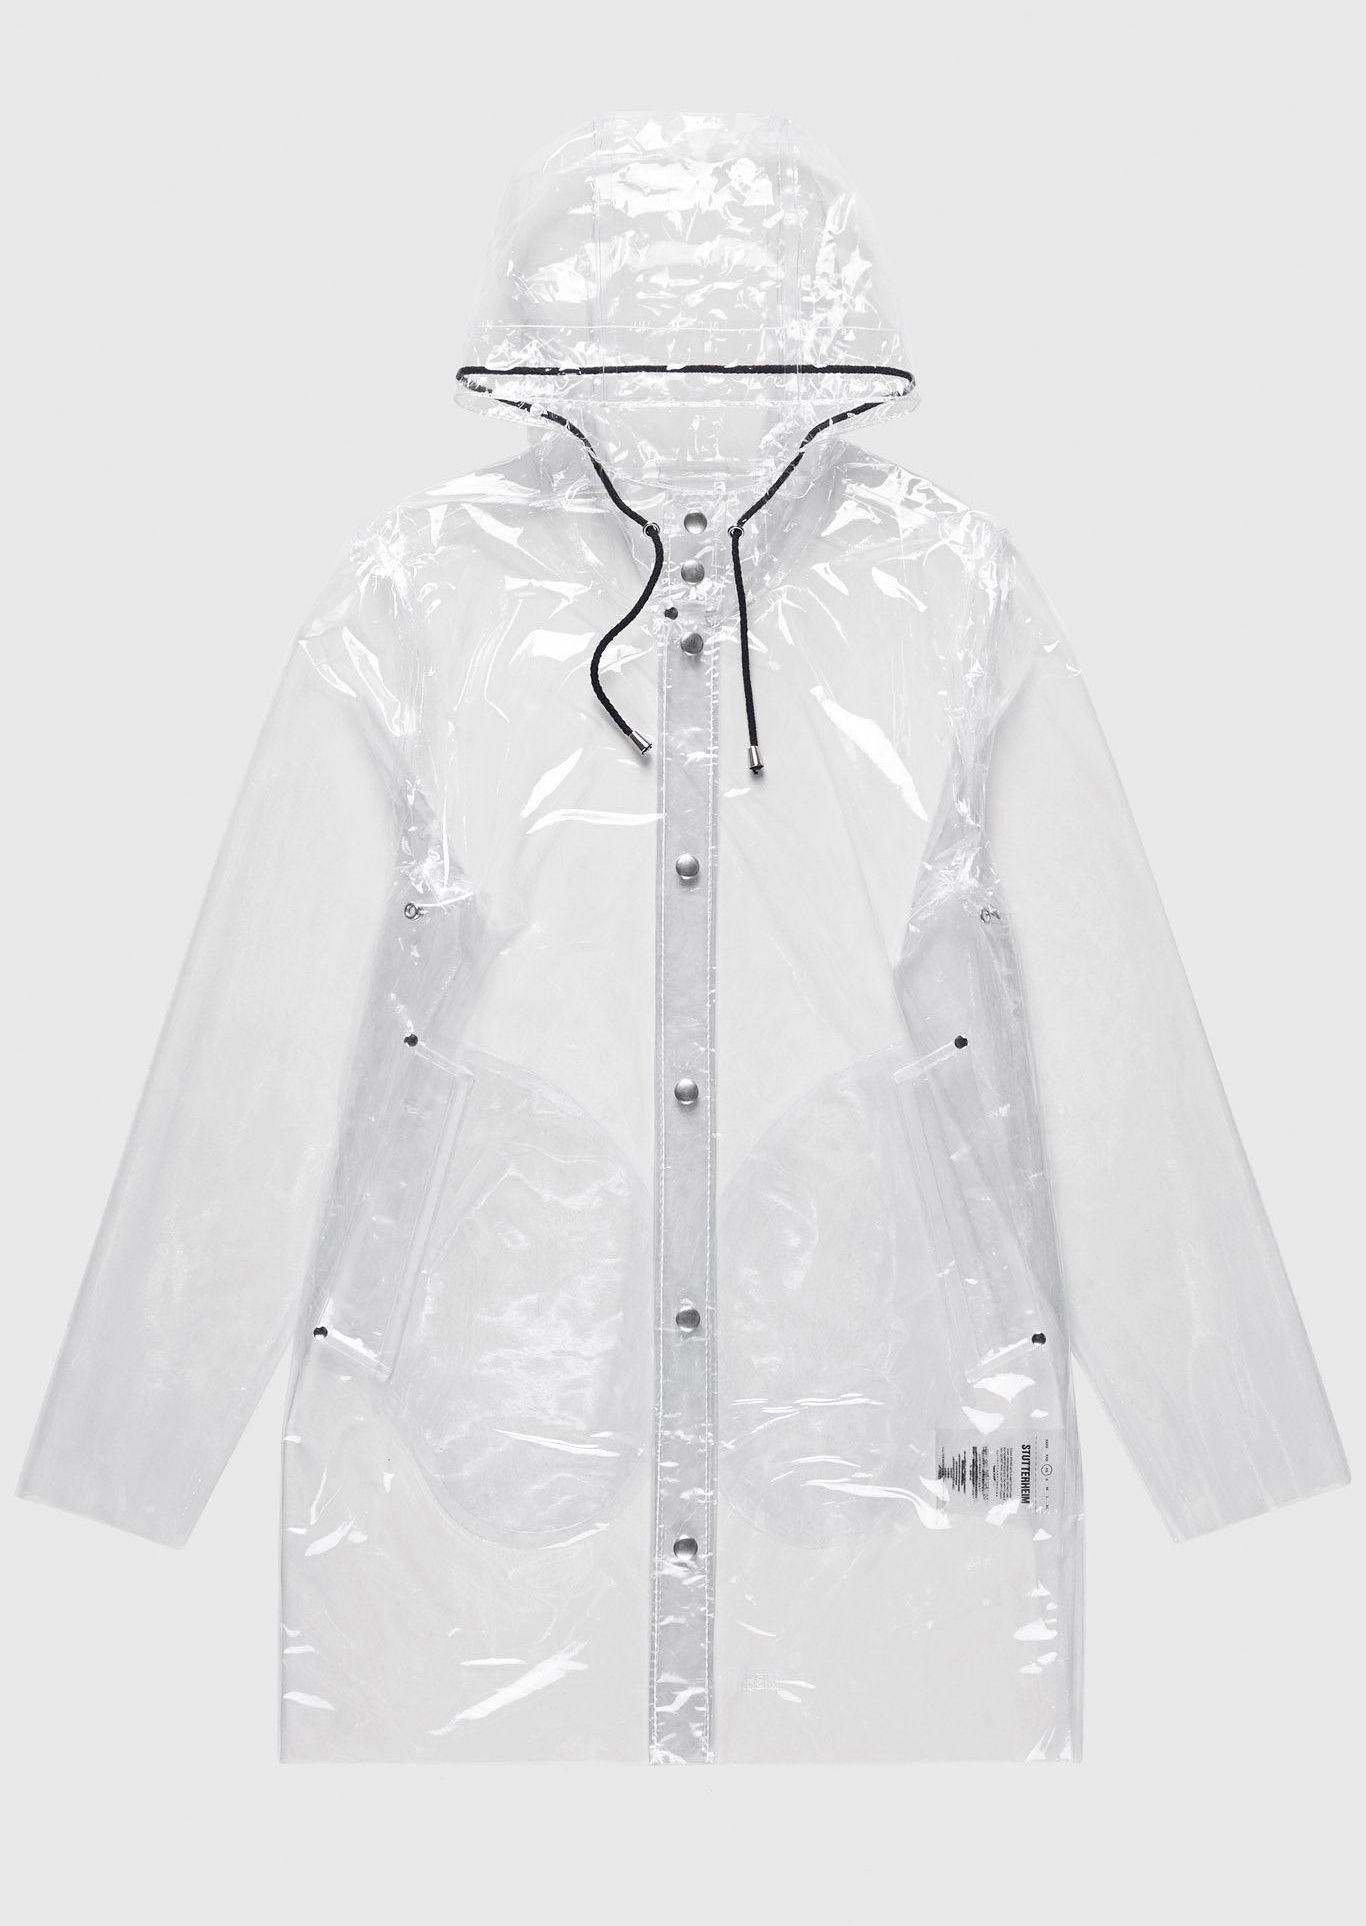 Chubasquero transparente para lluvia con capucha